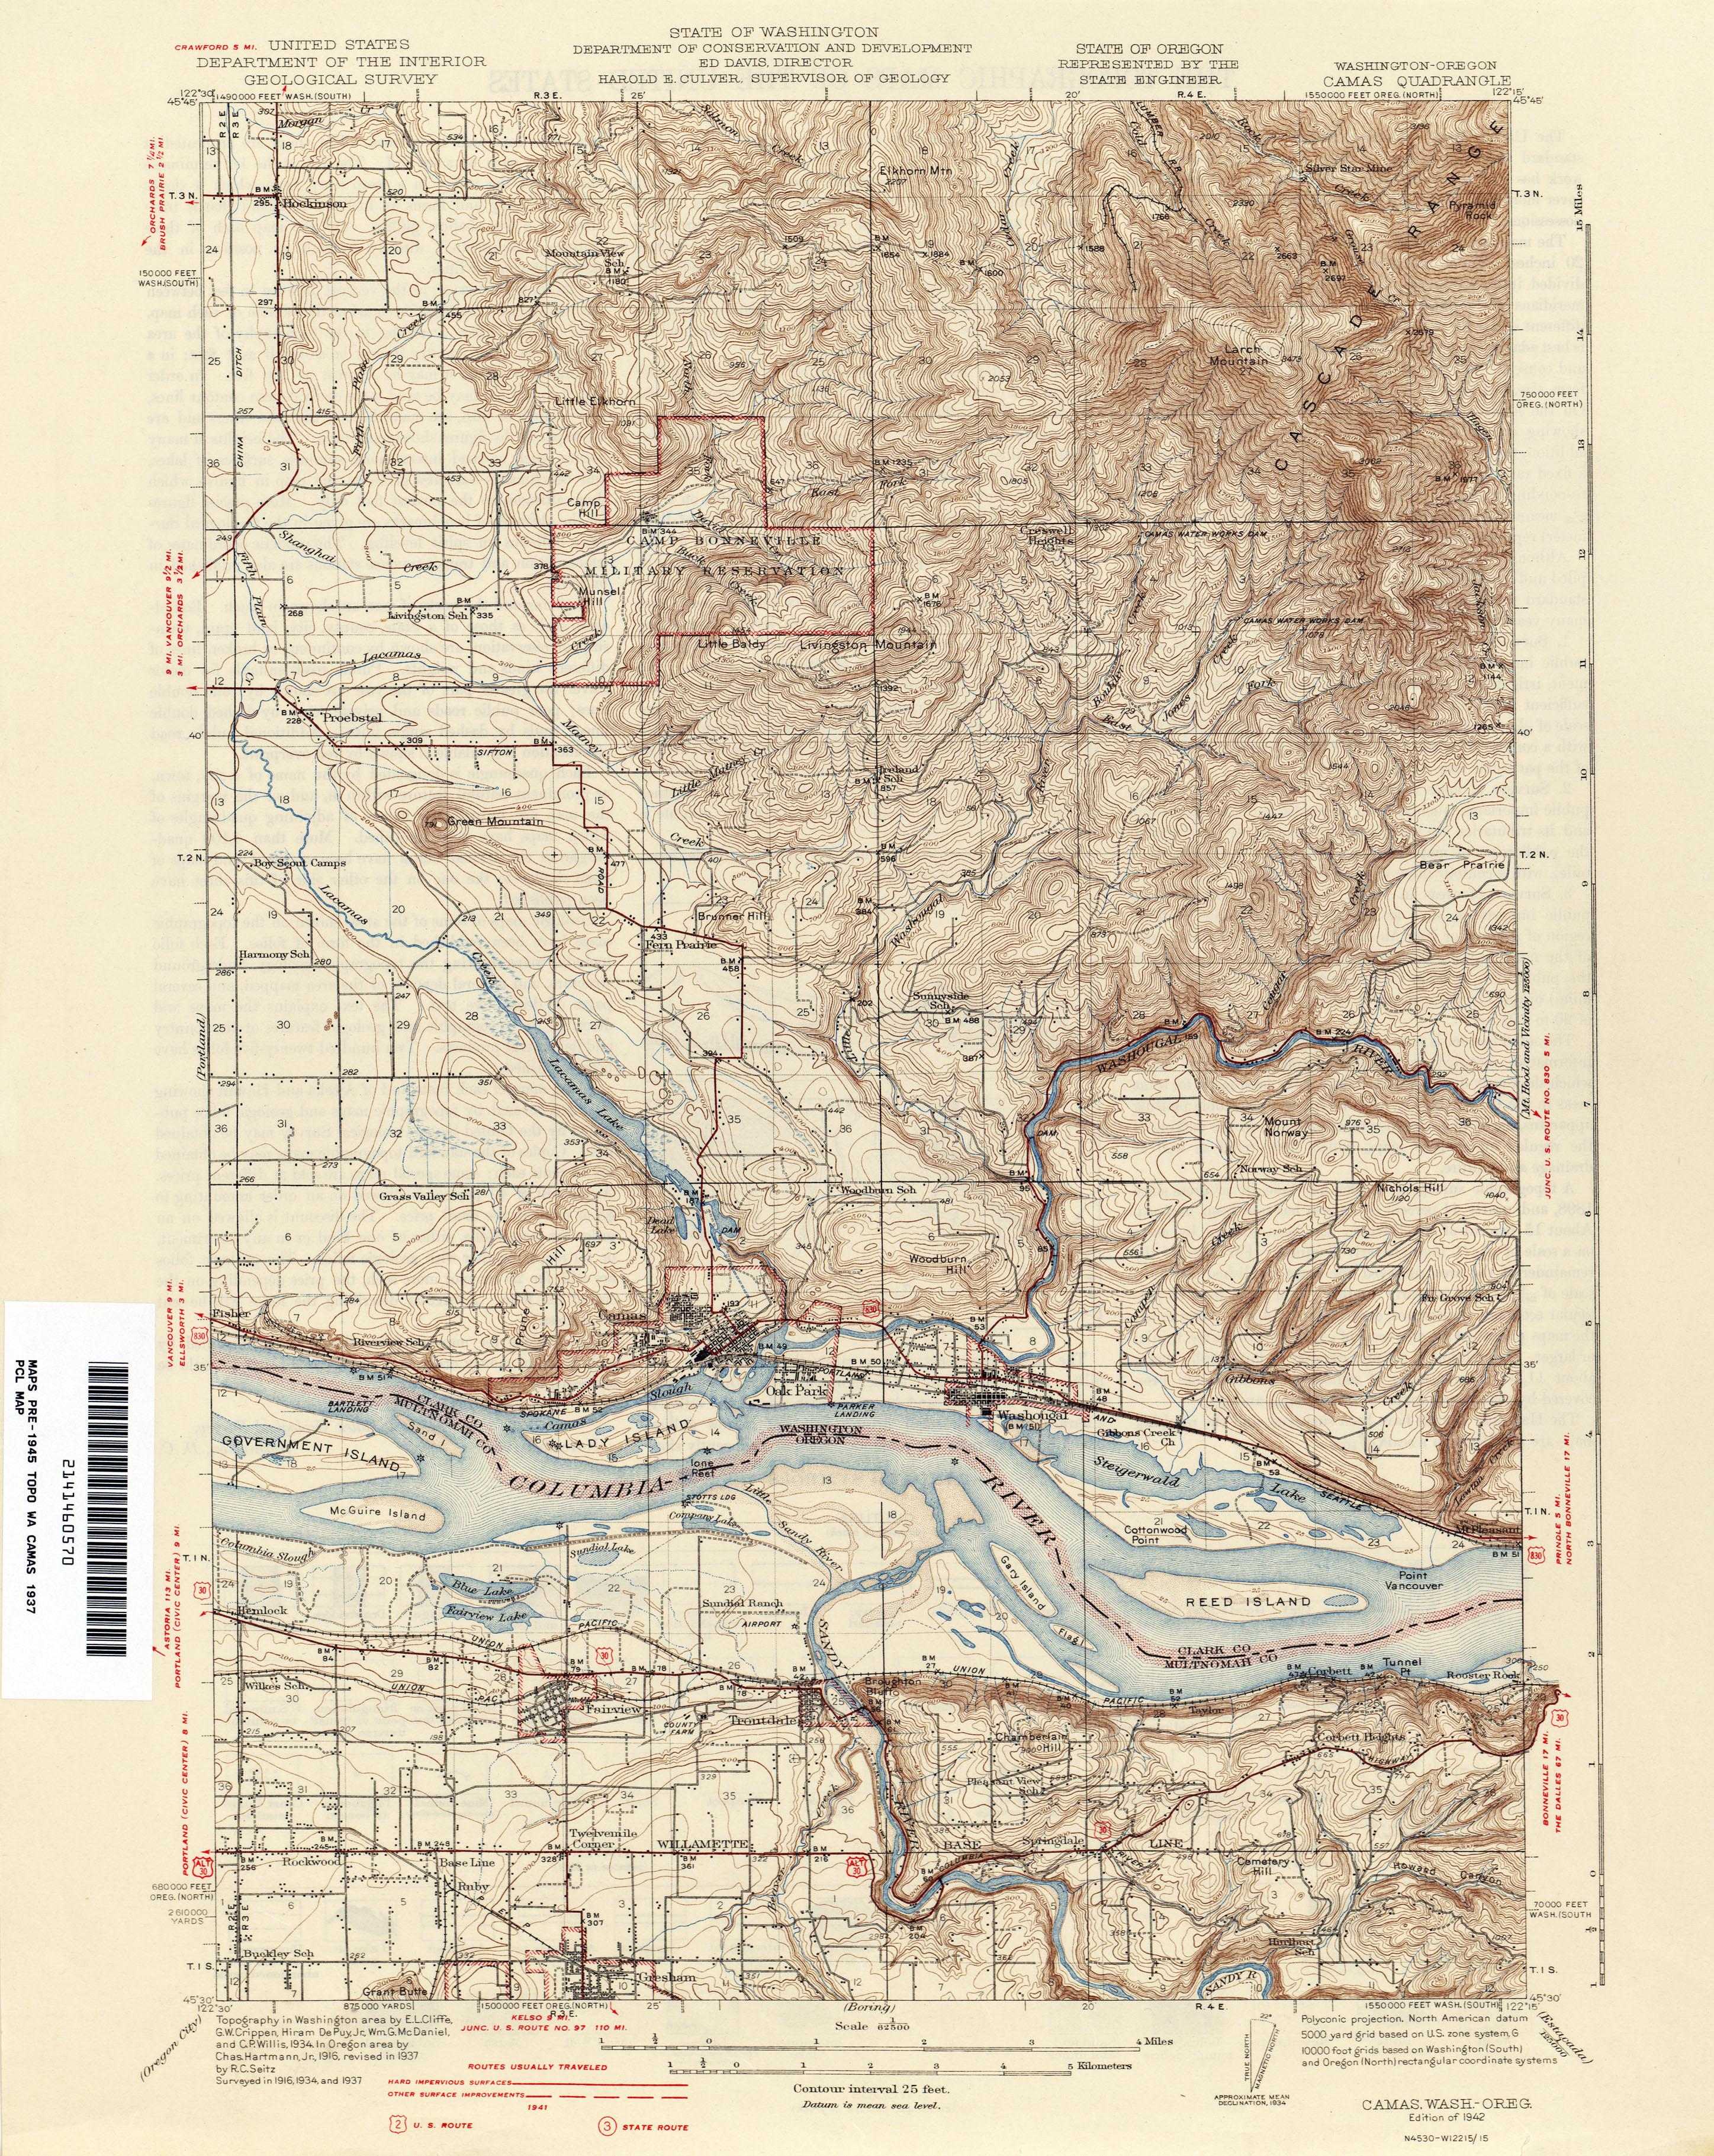 Washington Historical Topographic Maps PerryCastañeda Map - United states topo map